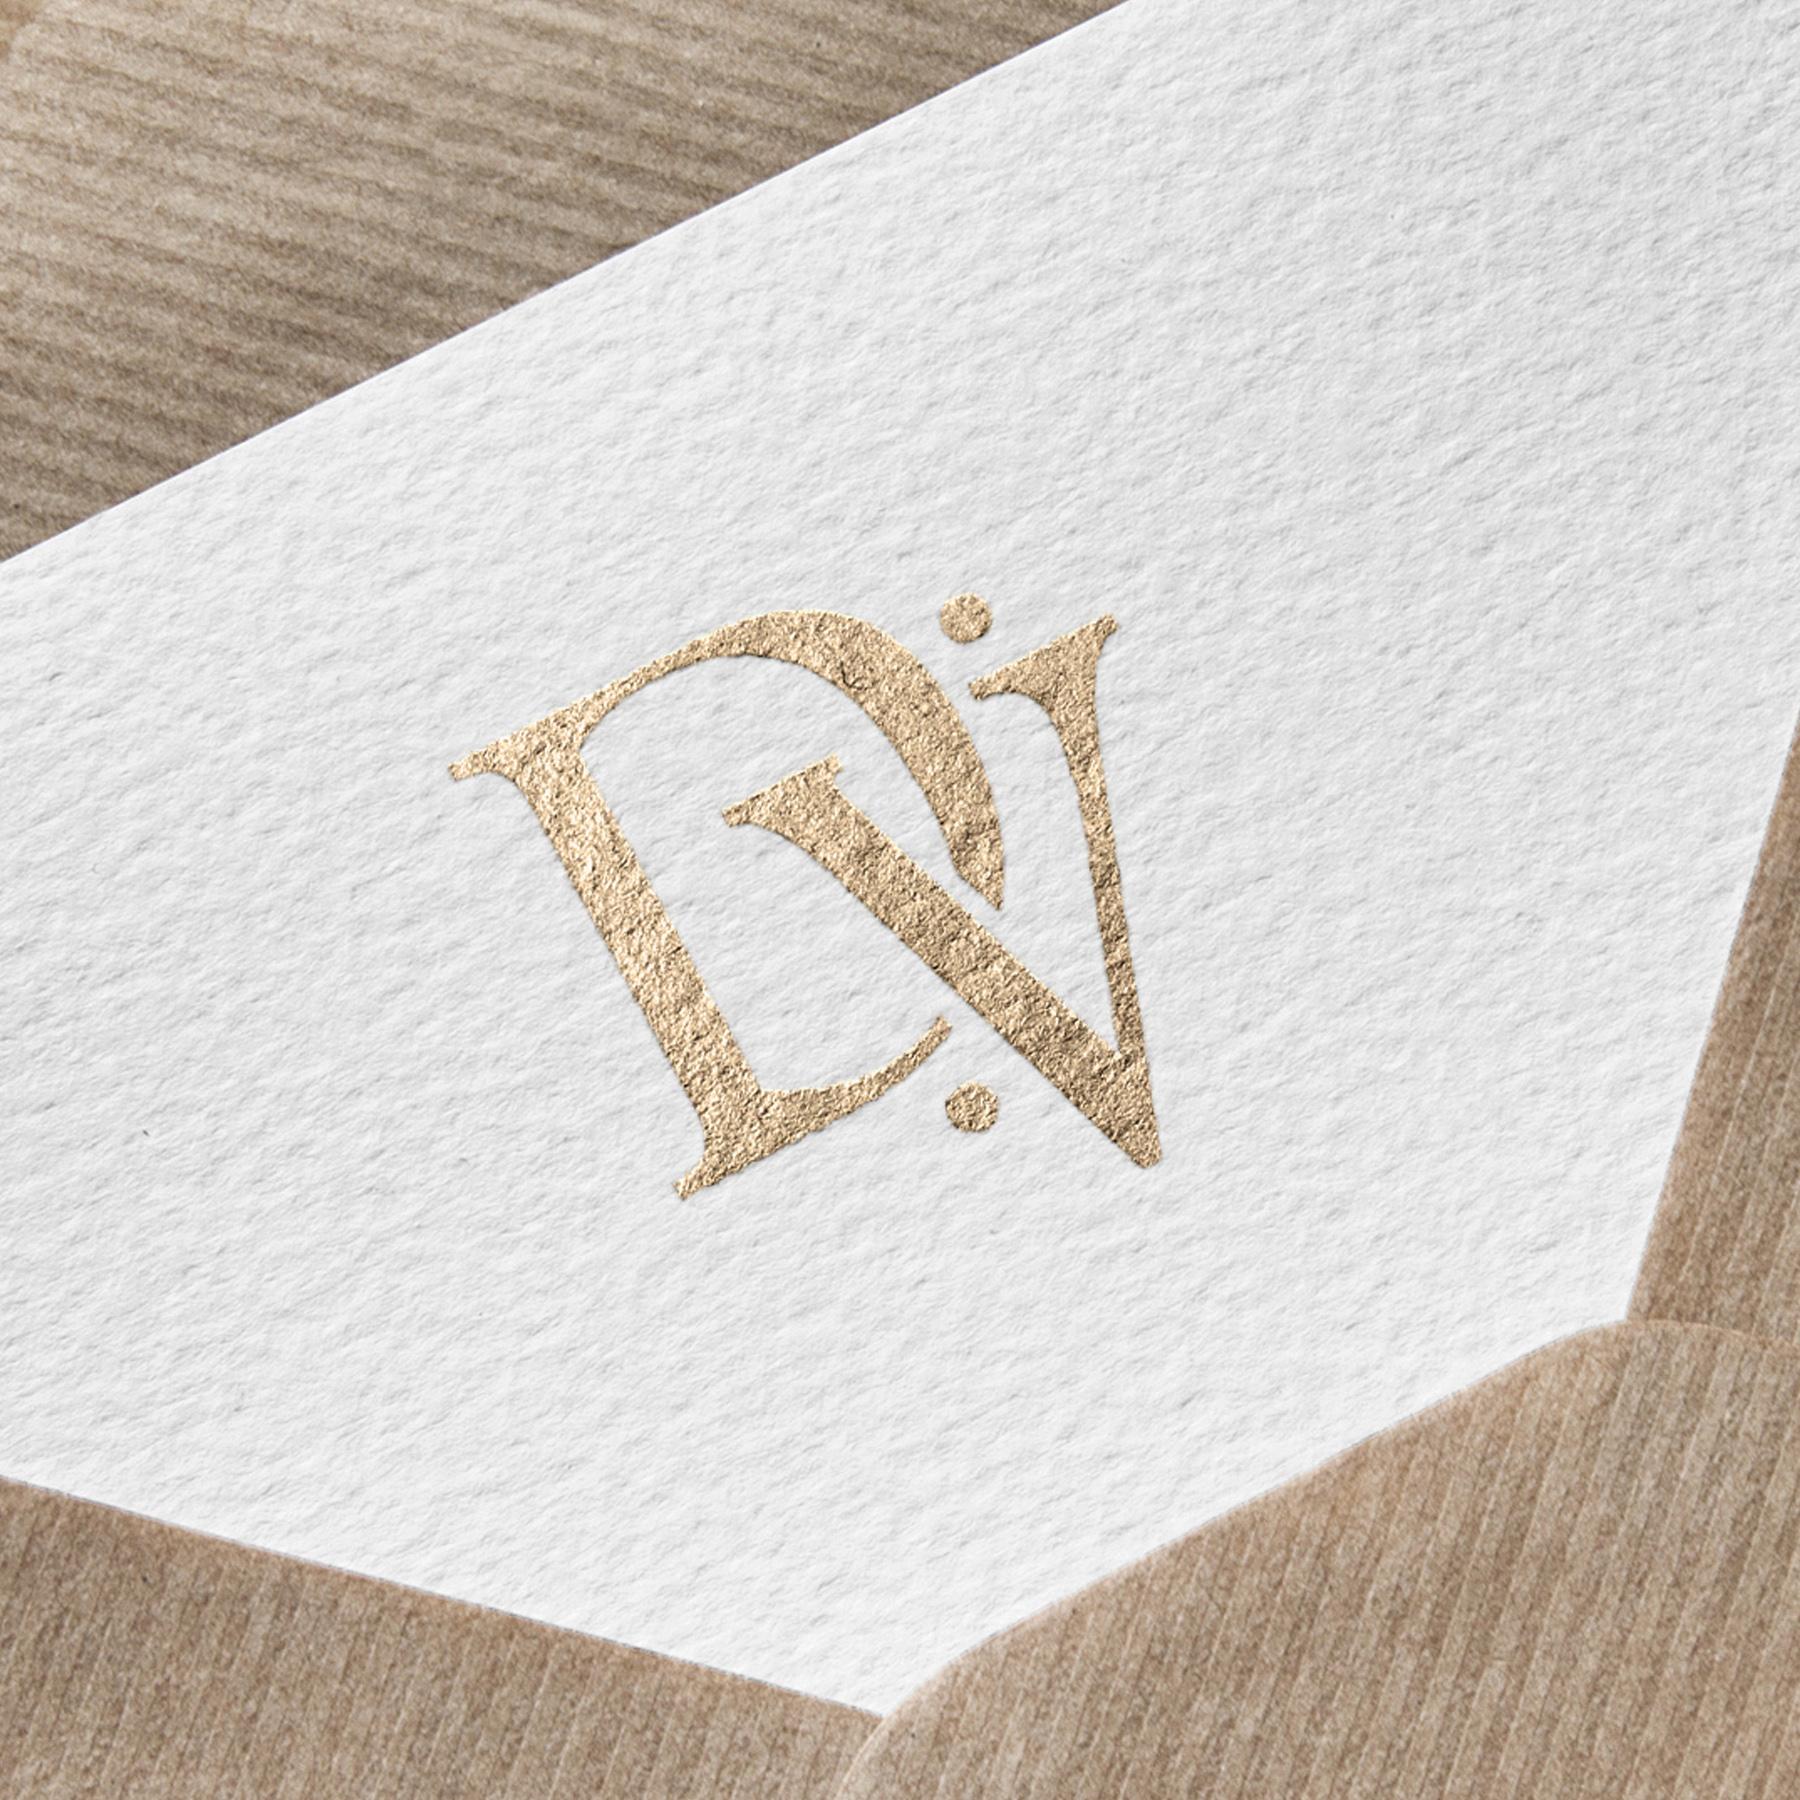 DaVinci Development Collaborative:  Branding, Web design, Environmental graphics.